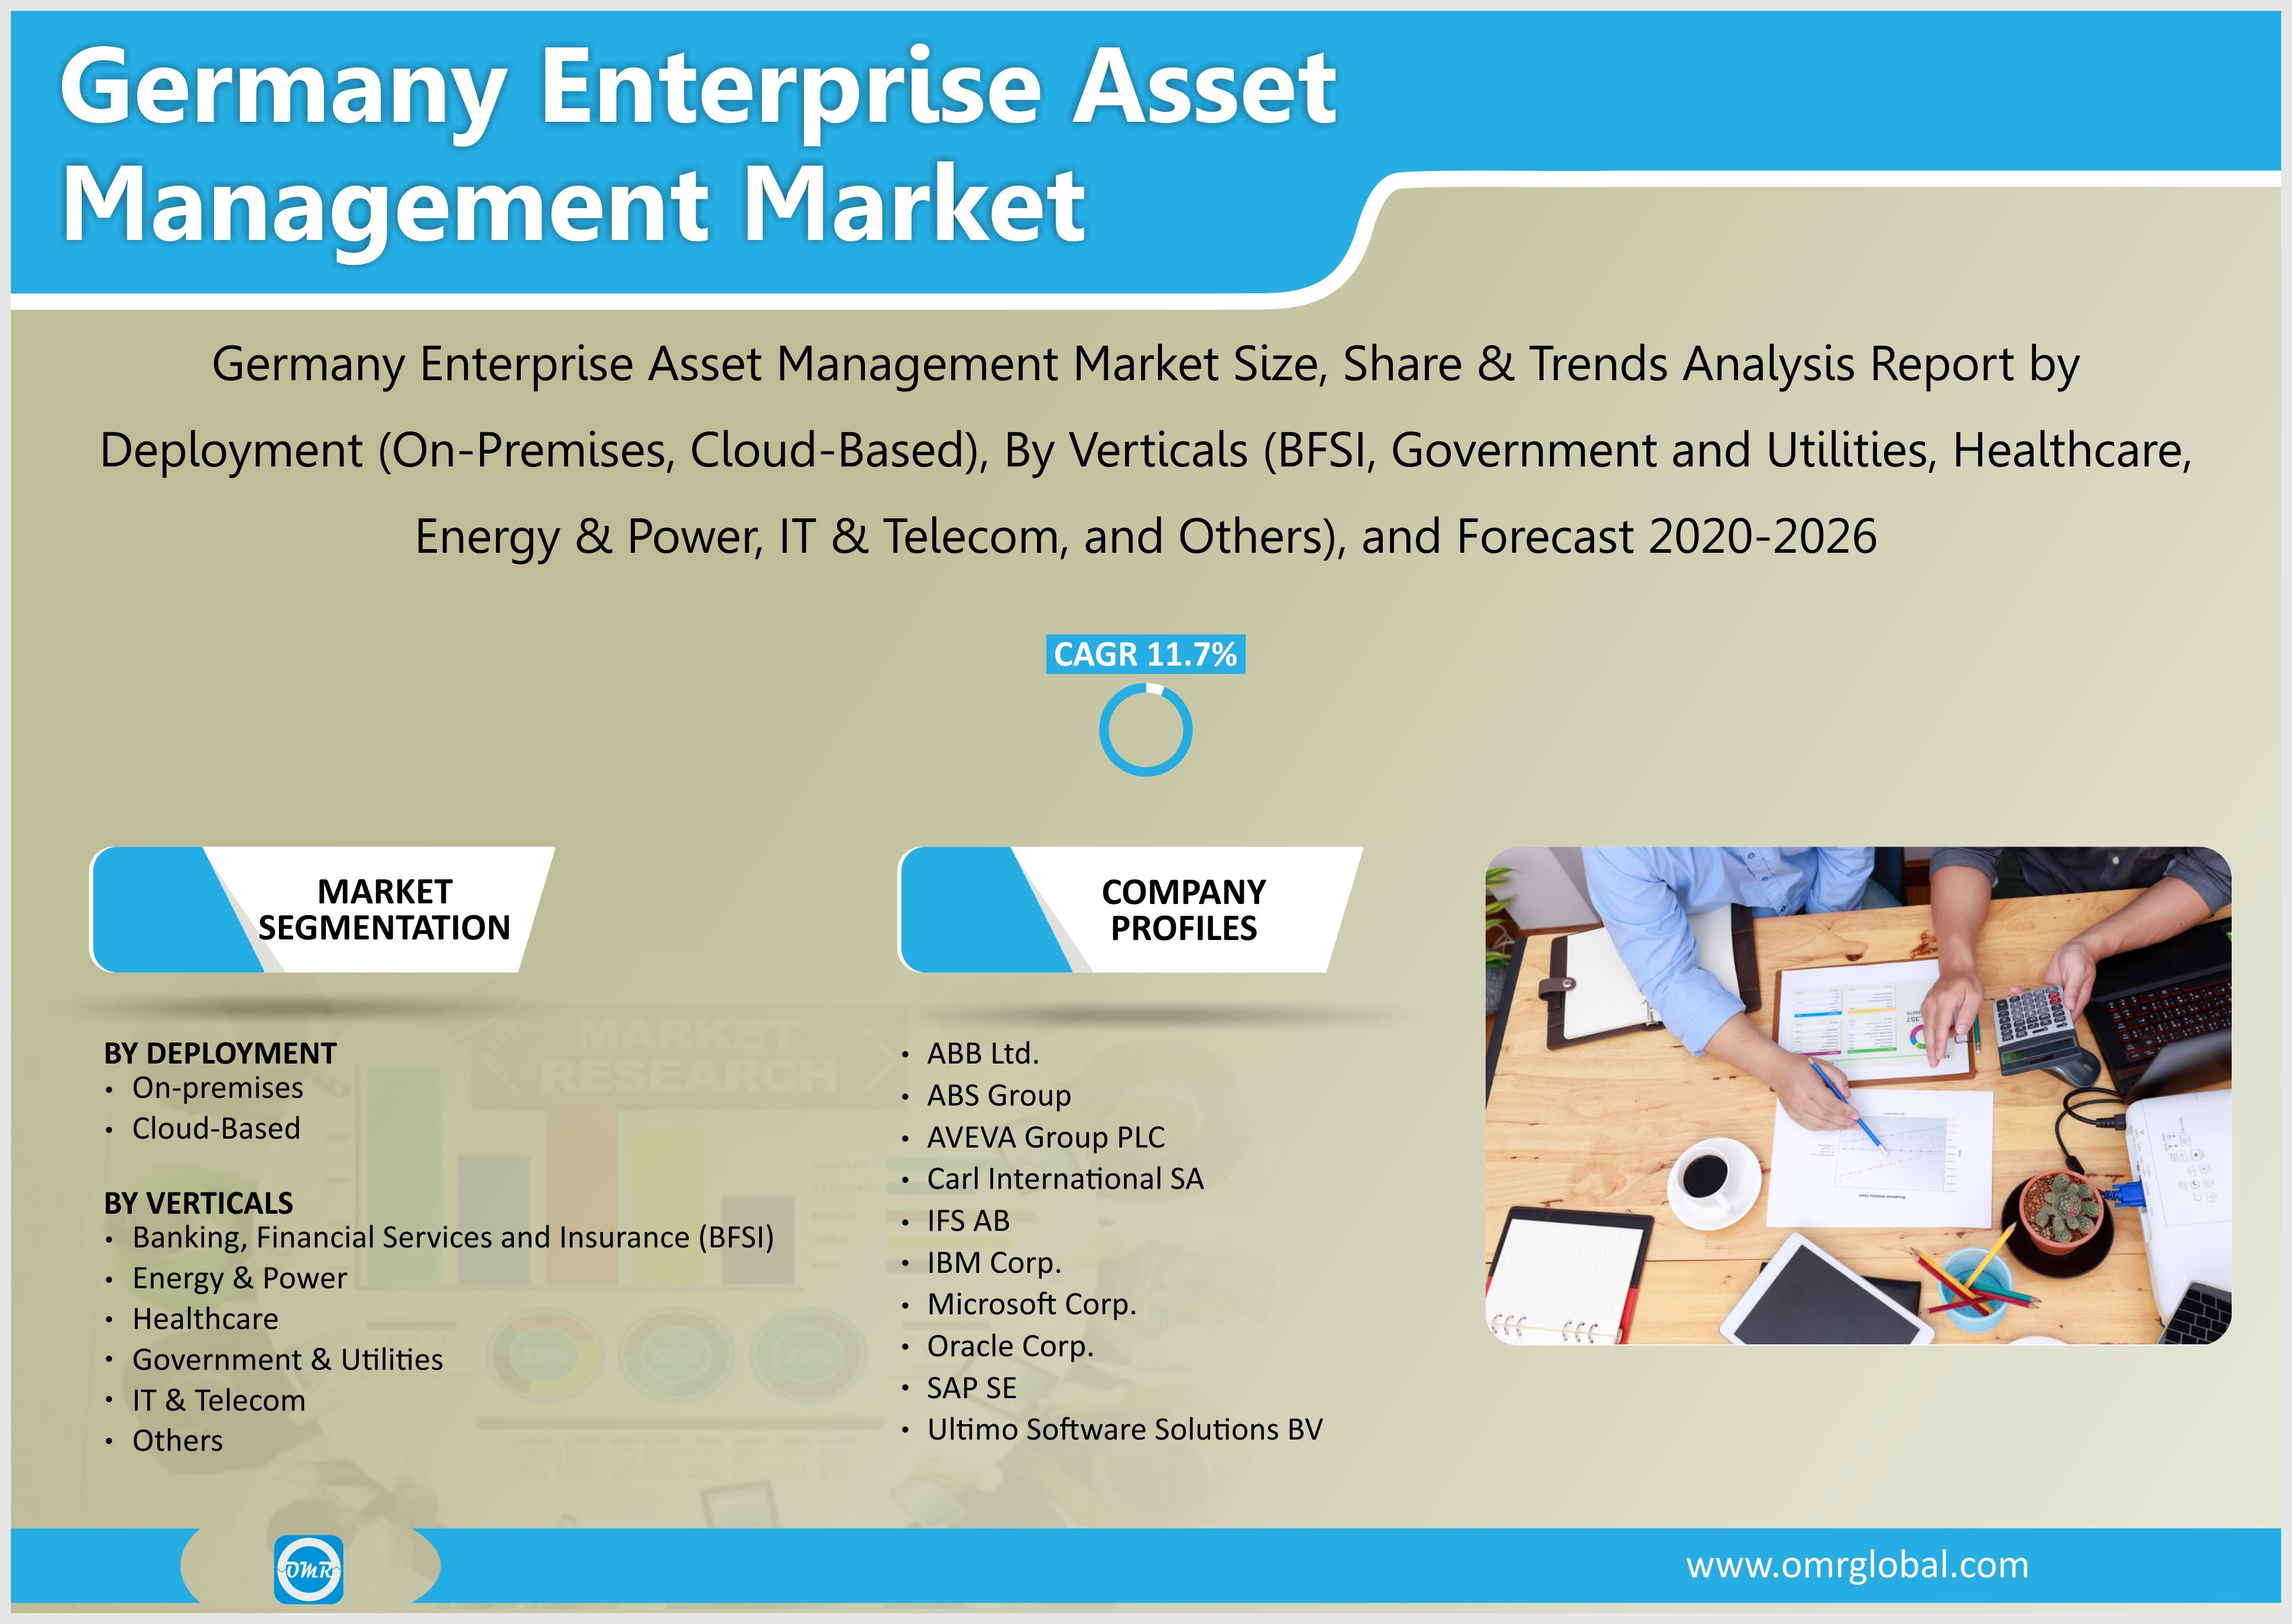 Germany Enterprise Asset Management Market Size Trends Share Forecast 2020 2026 Asset Management Competitive Analysis Financial Analysis